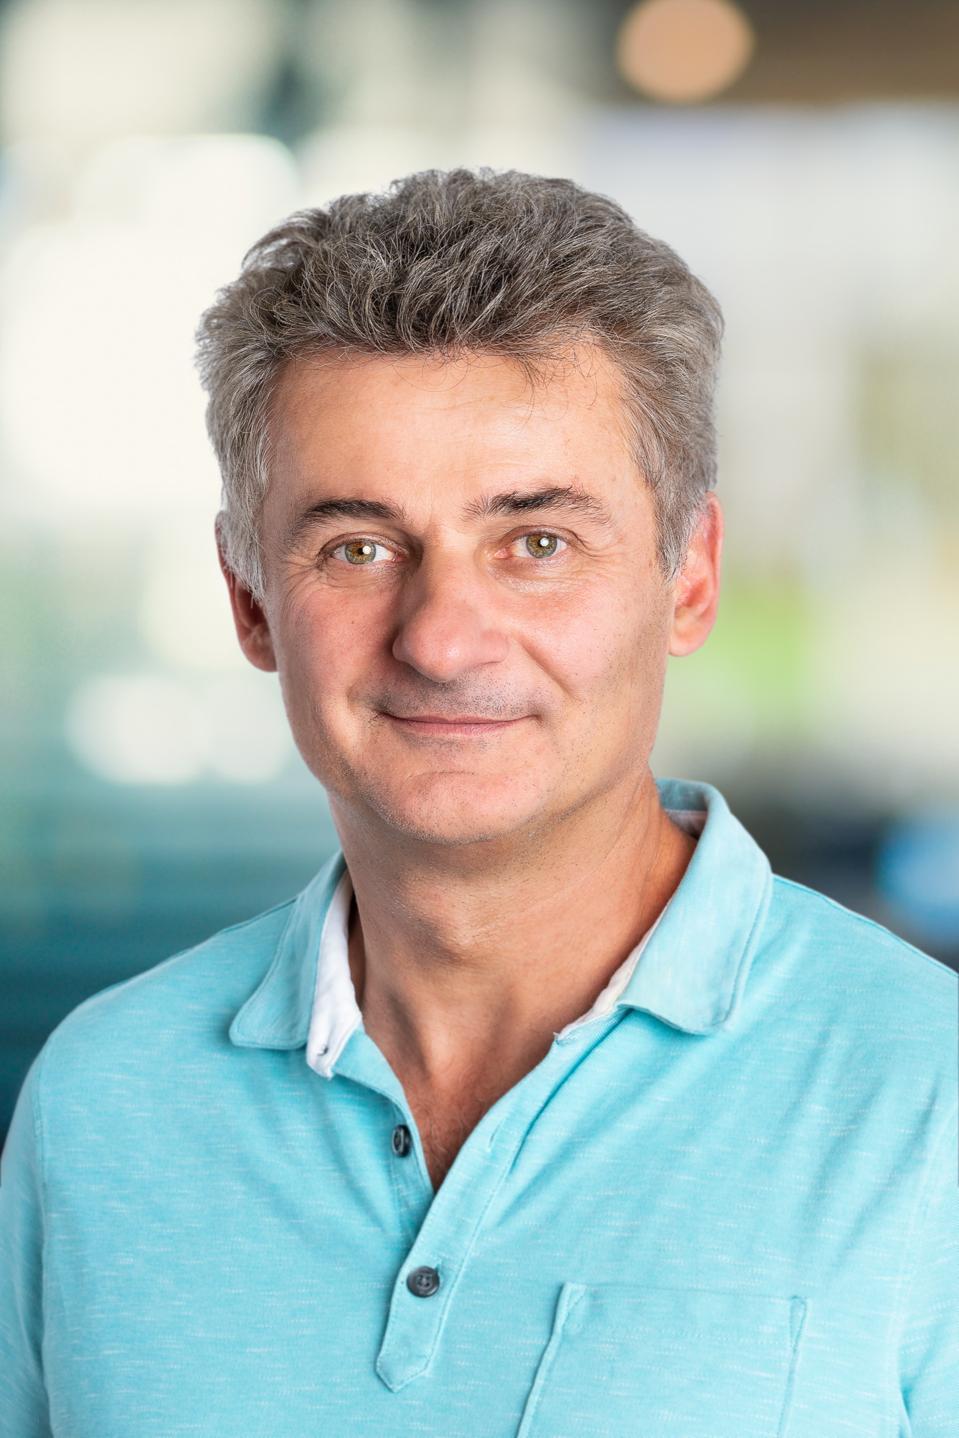 Snowflake cofounder and CTO Benoit Dageville.